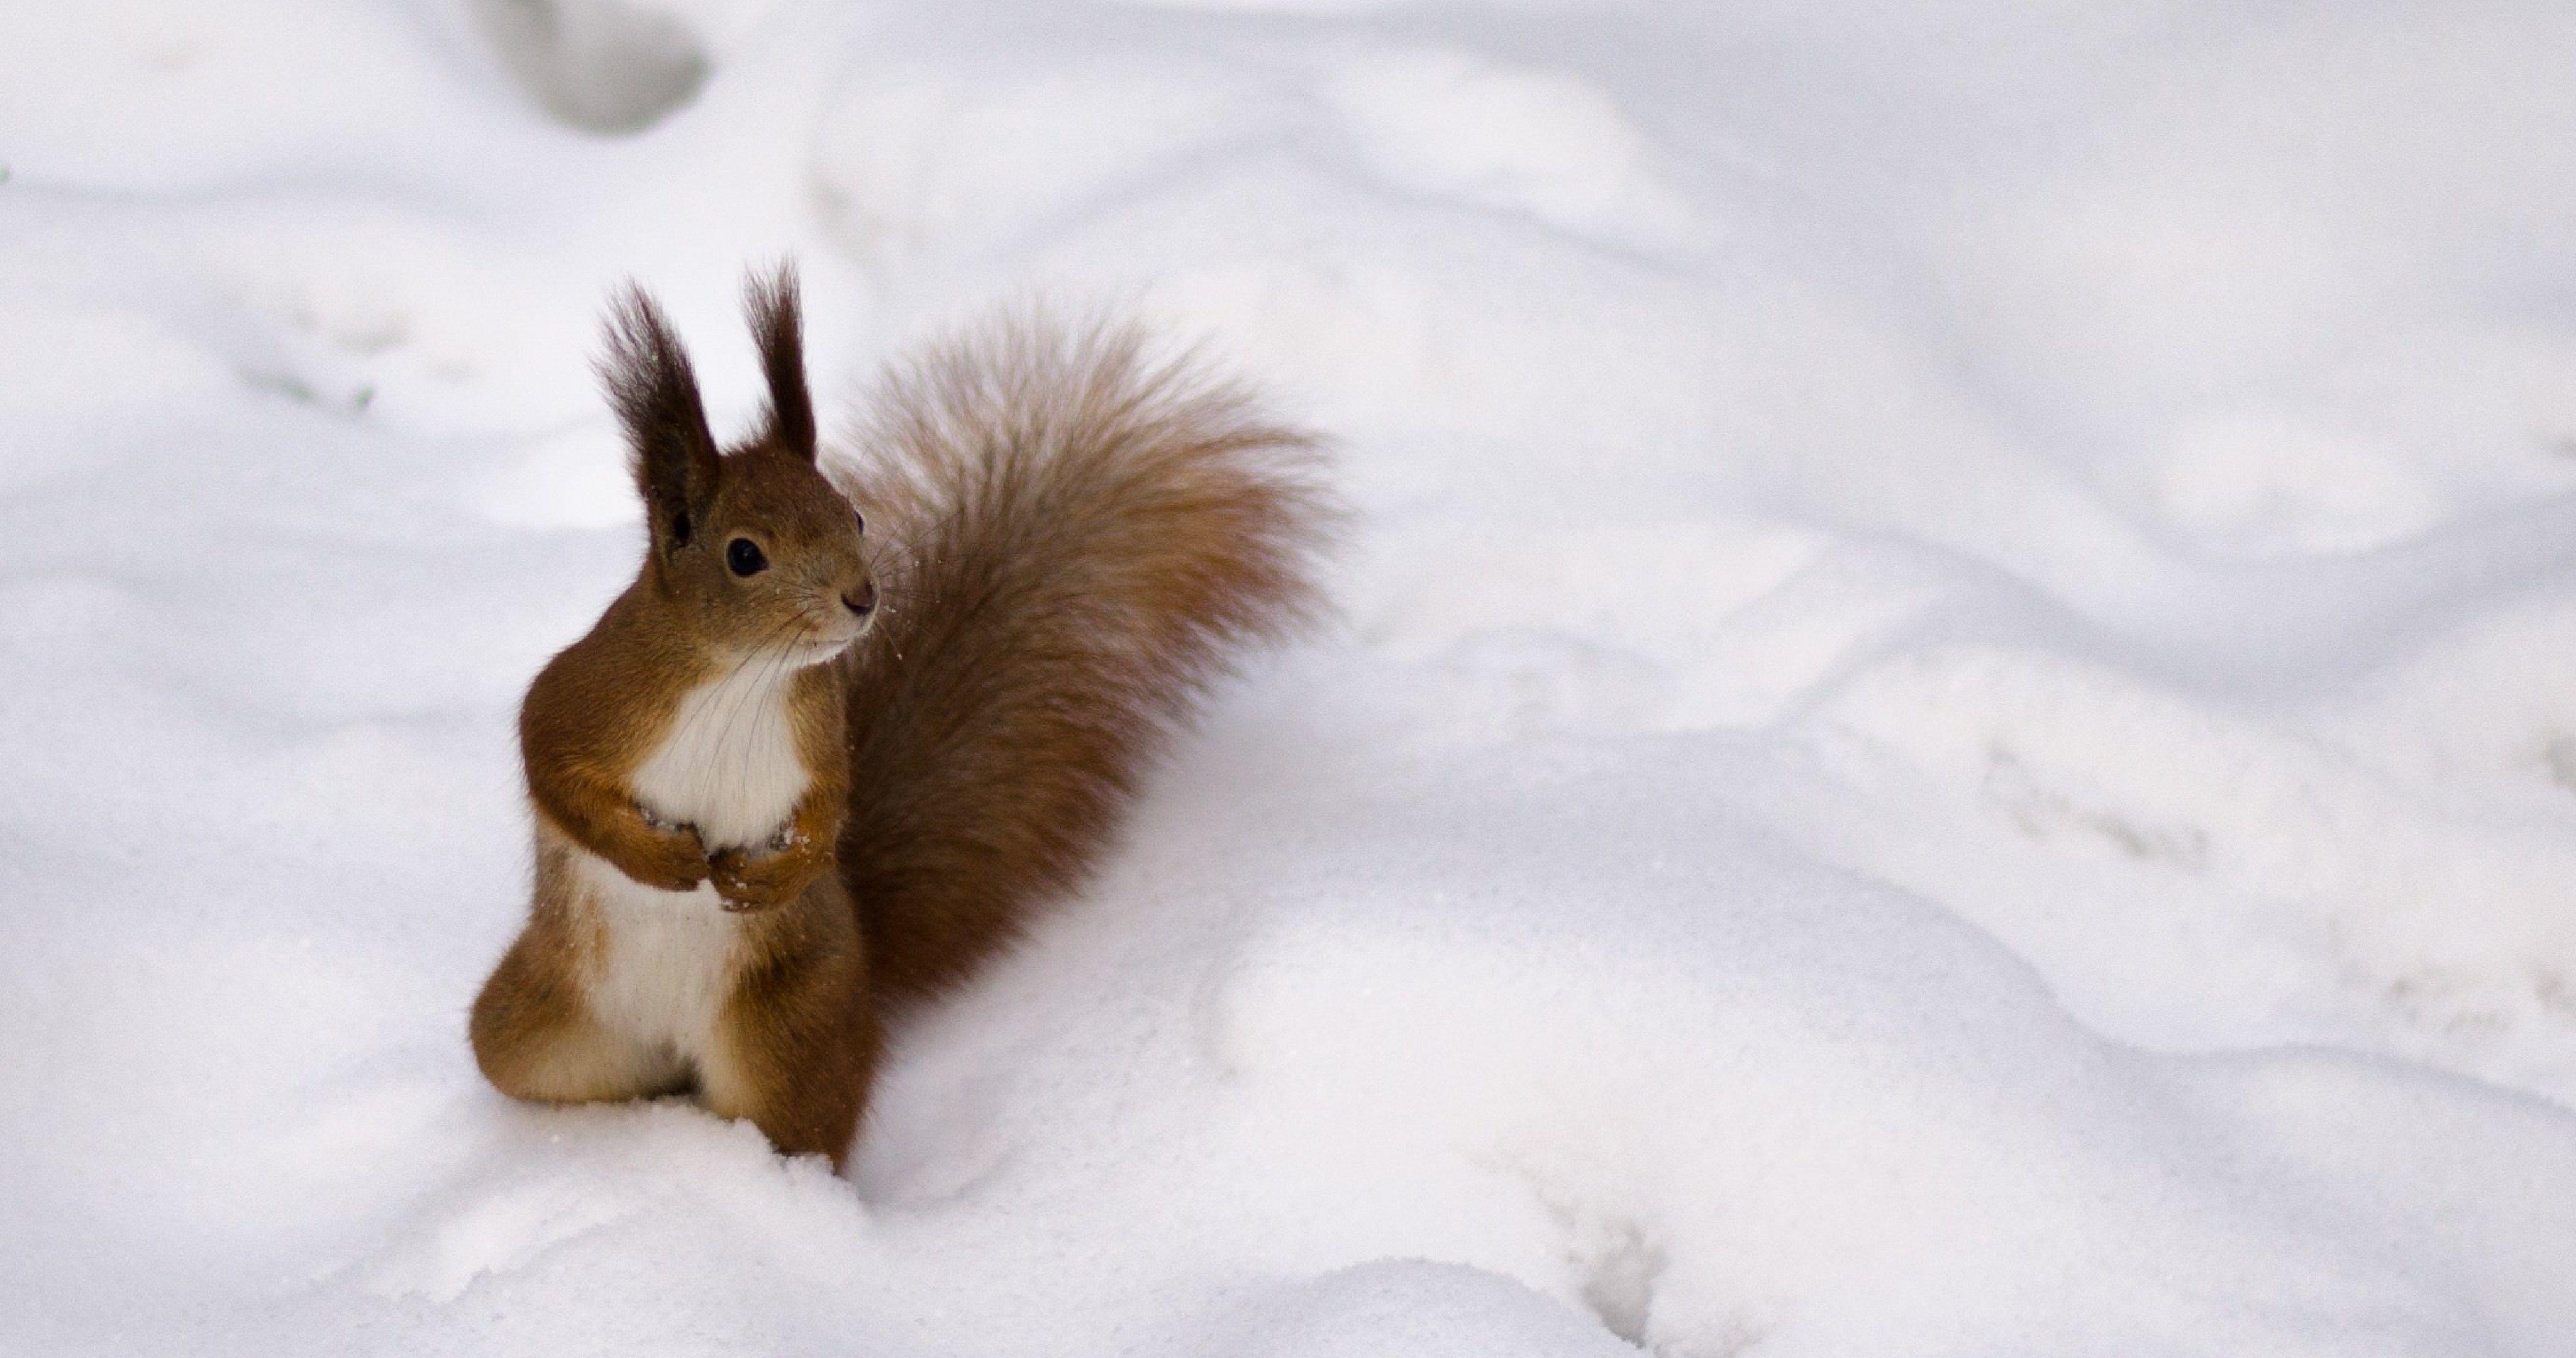 Protein Fluffy 4k Ultra Hd Wallpaper Animals Cute Animals Squirrel